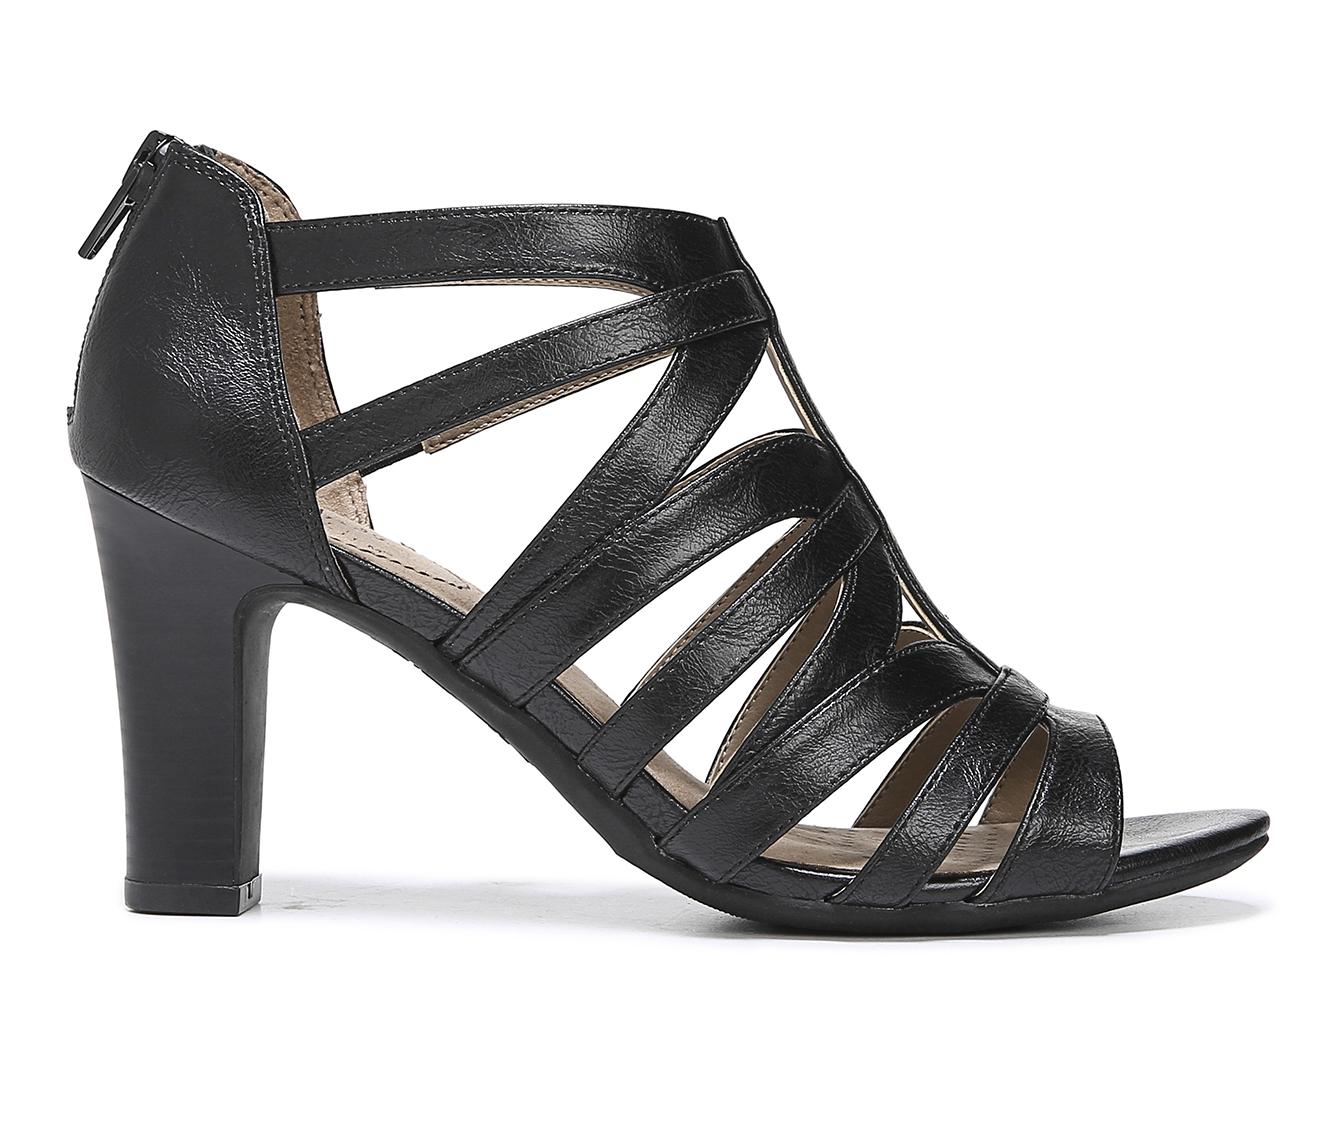 LifeStride Carter Women's Dress Shoe (Black Faux Leather)